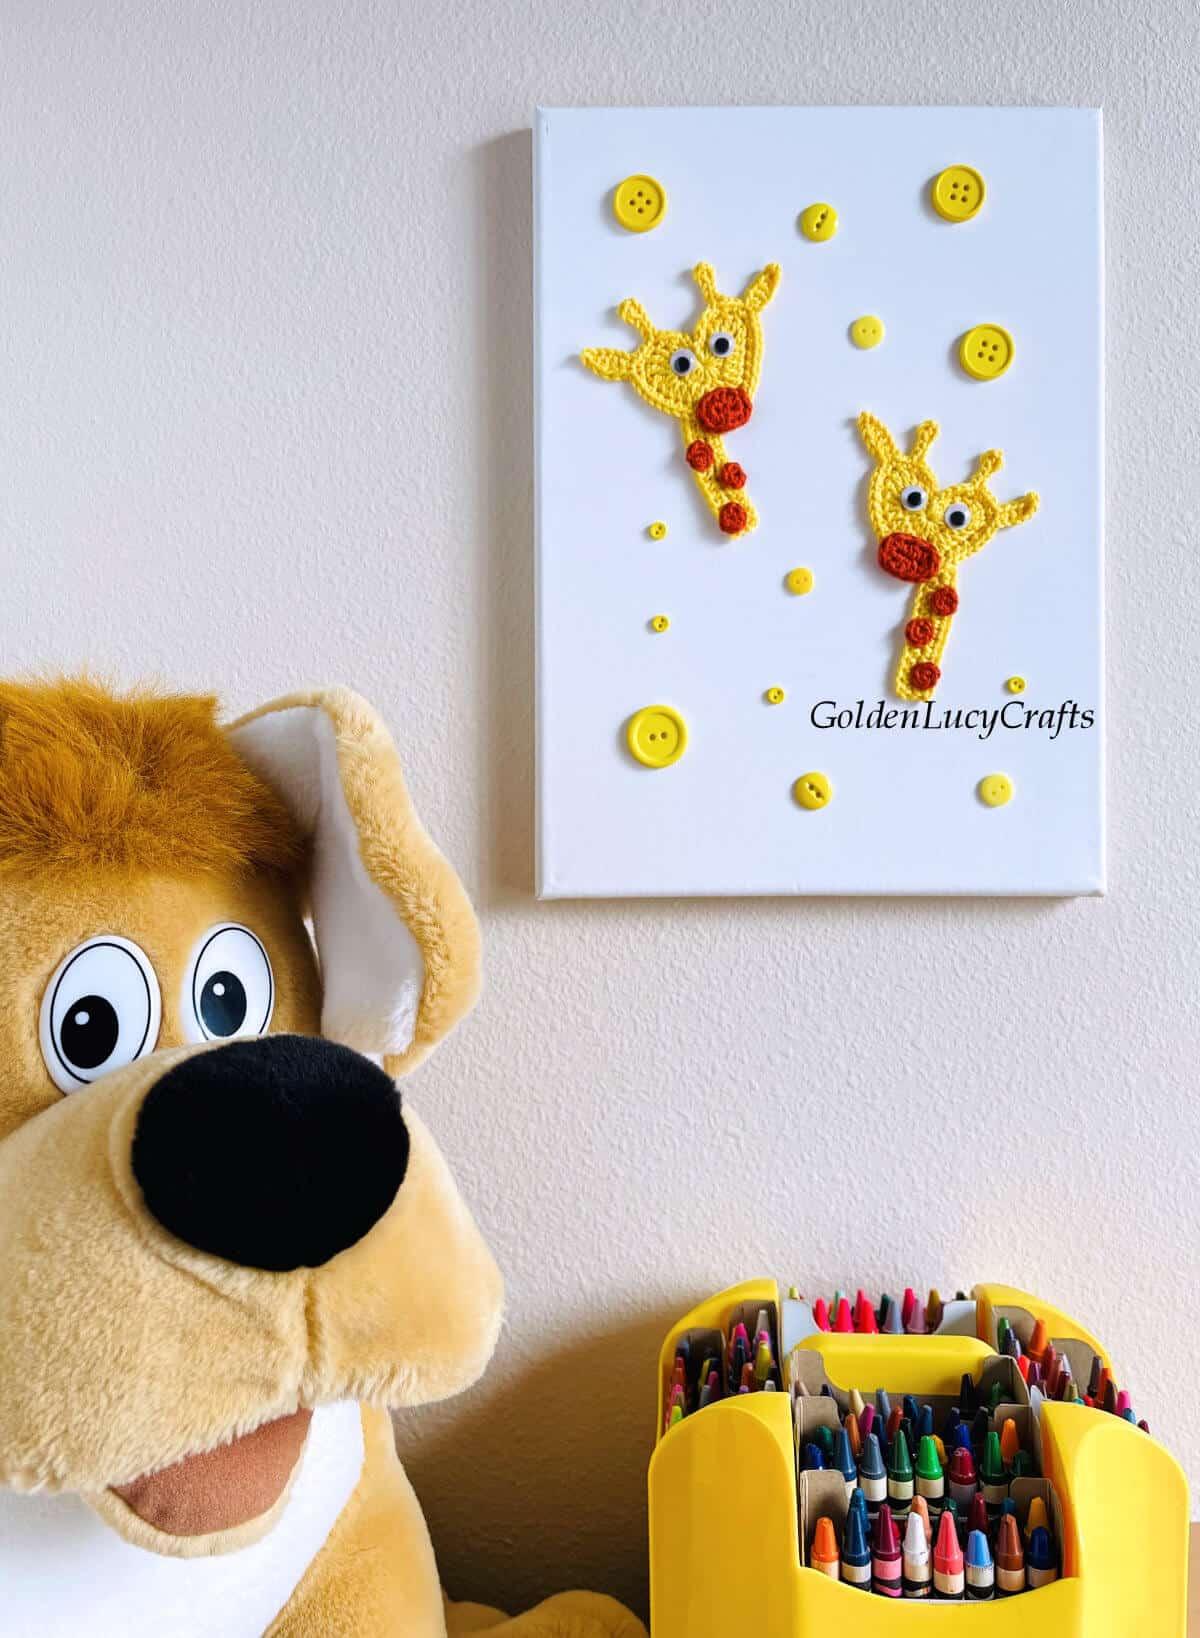 Giraffe crochet wall hanging, dog toy next to it.